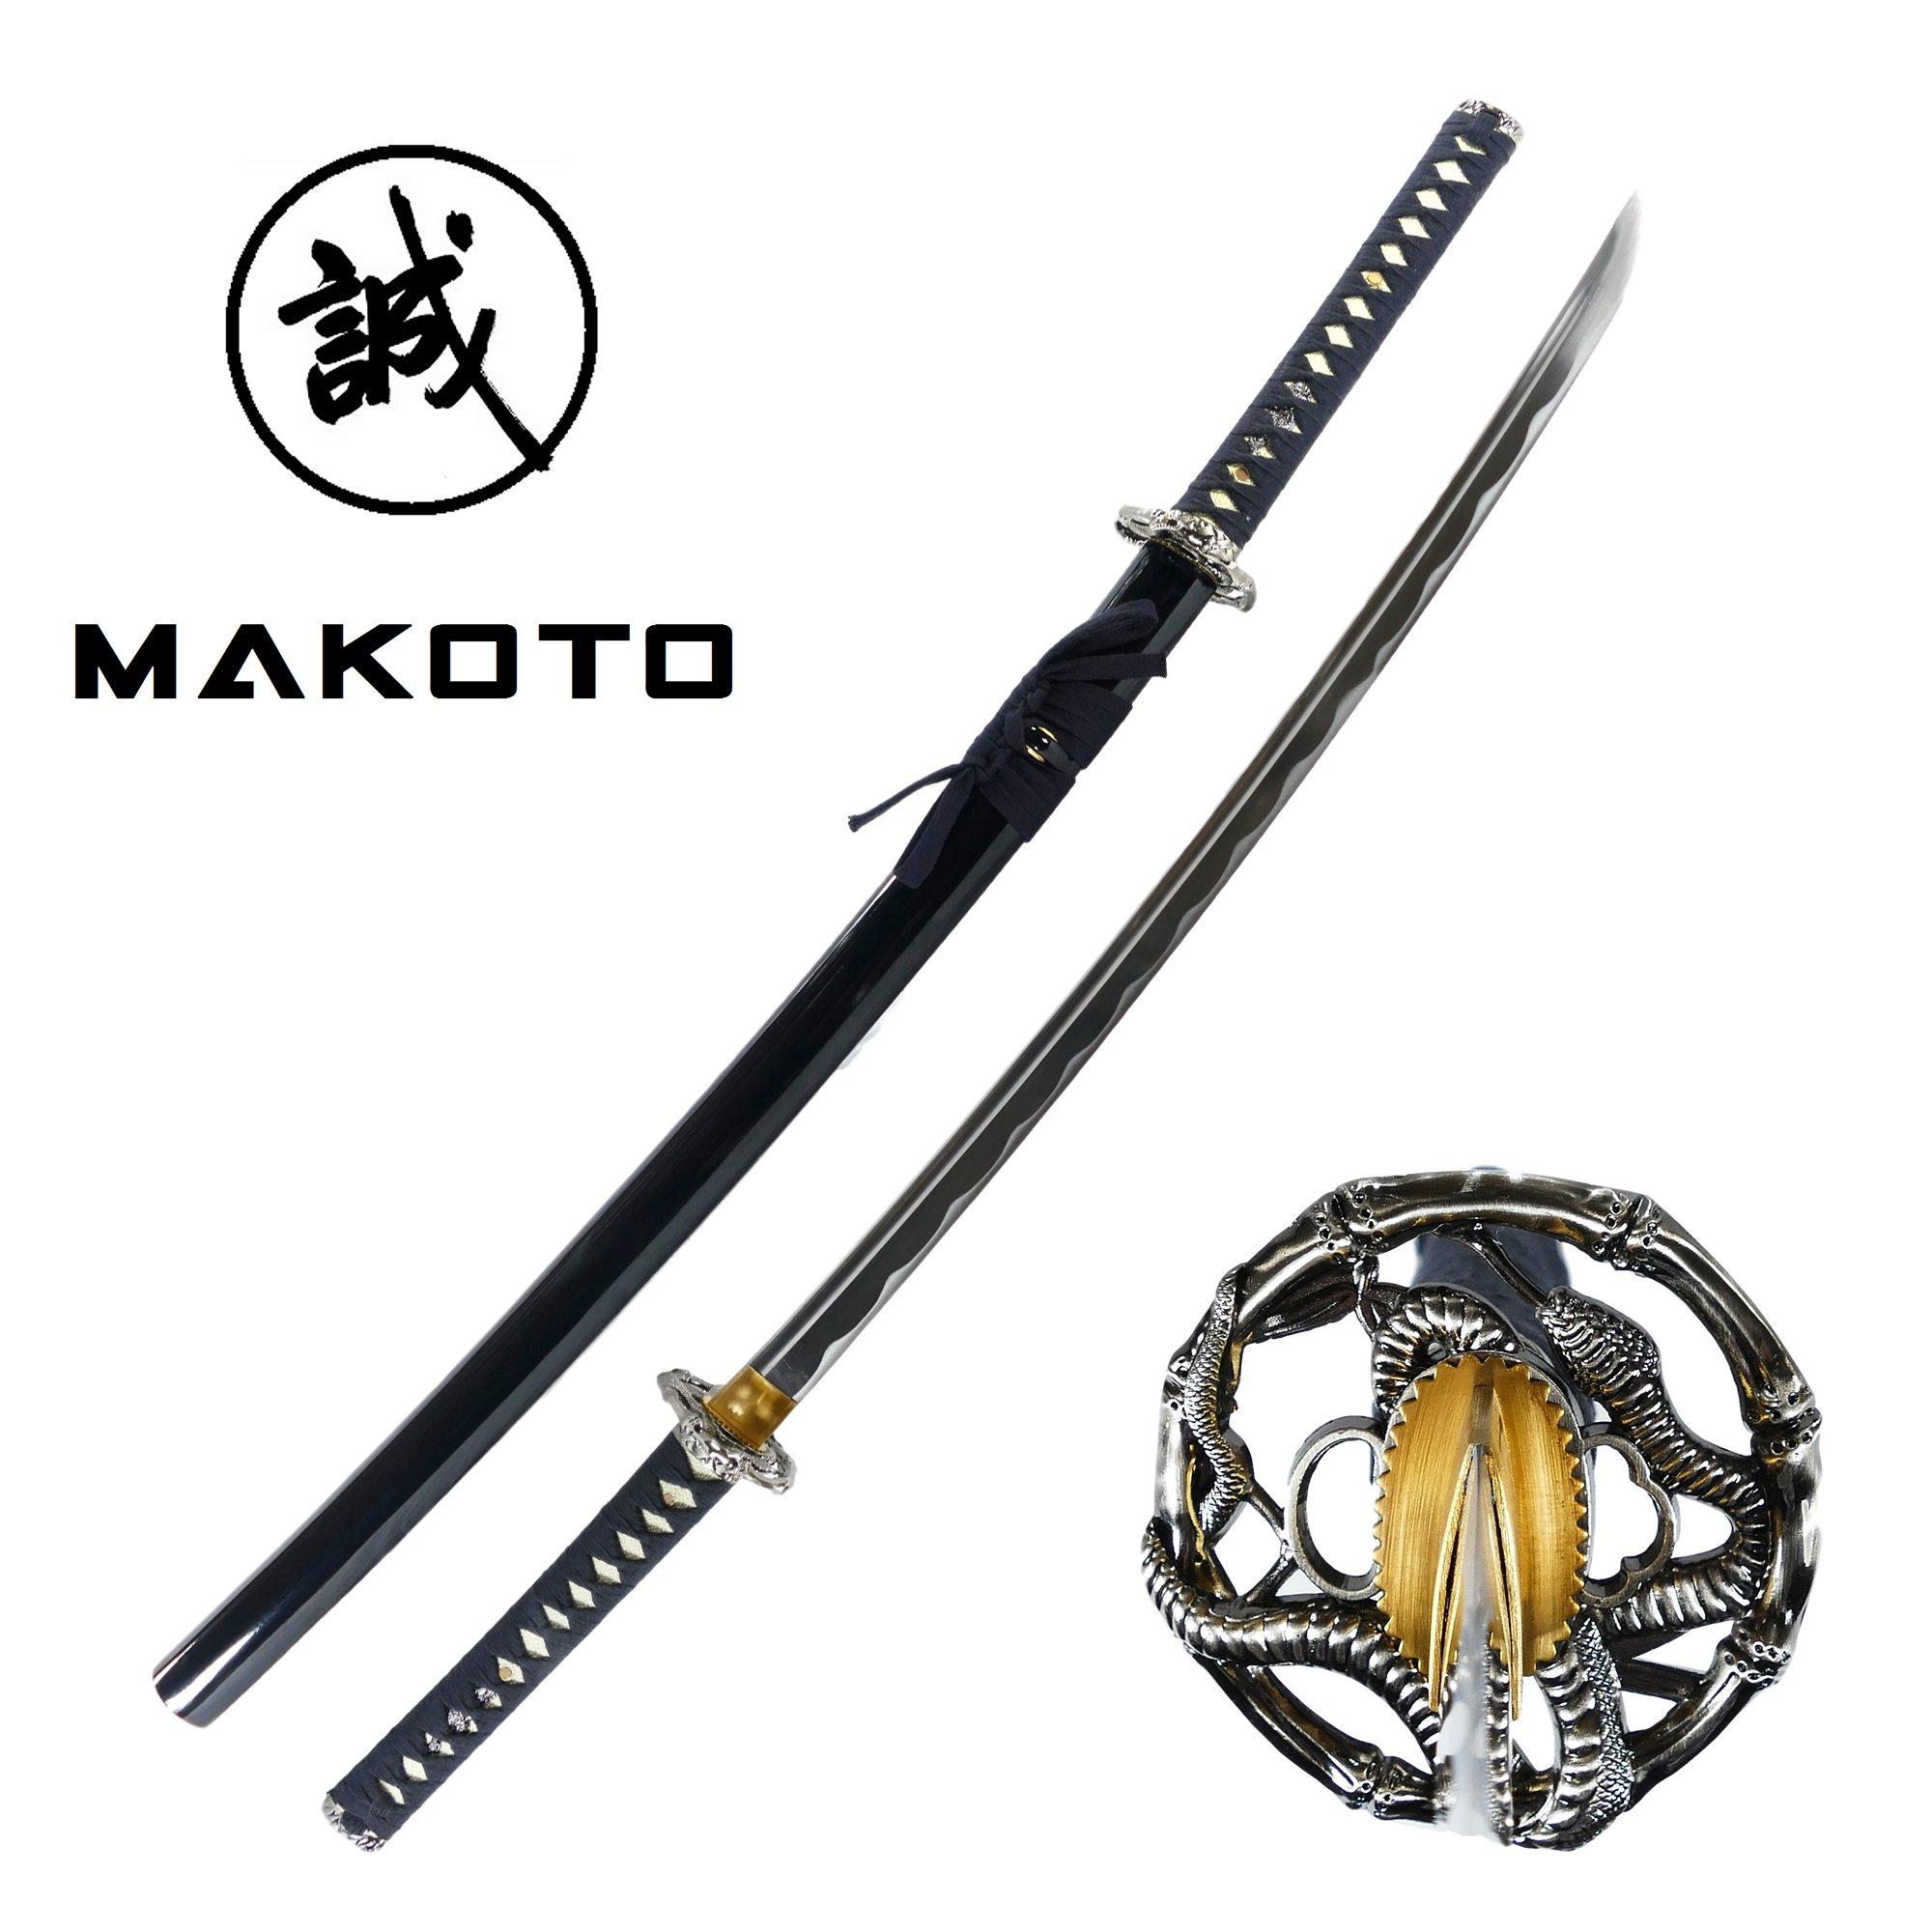 MAKOTO Handmade Sharp Katana Samurai Sword 40'' - Serpent Cobra Snake Tsuba (Black) by MAKOTO